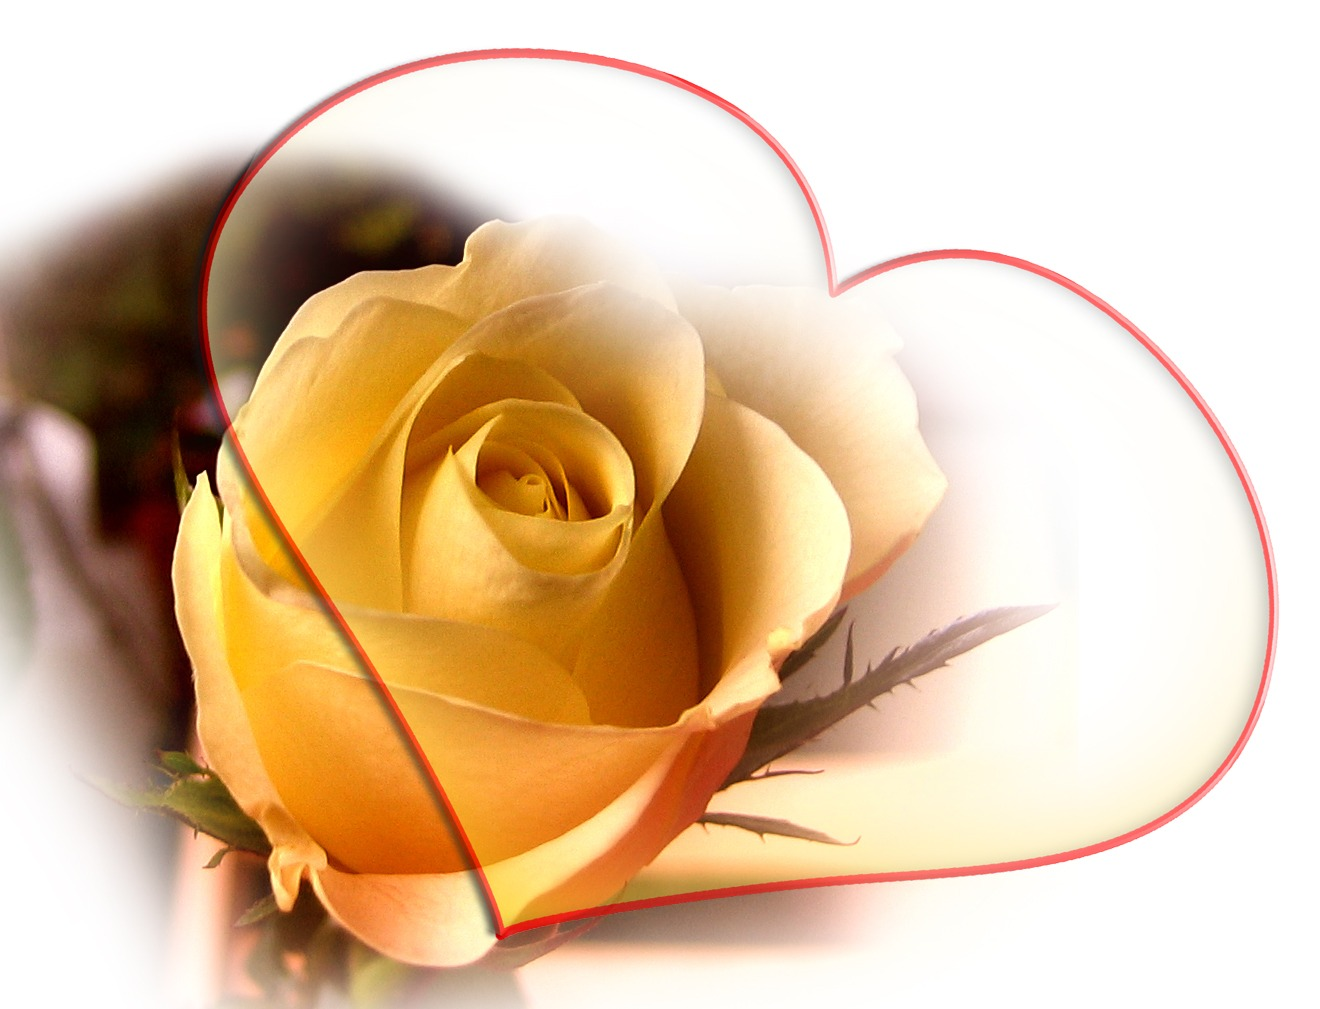 yellow love rose - HD1280×978